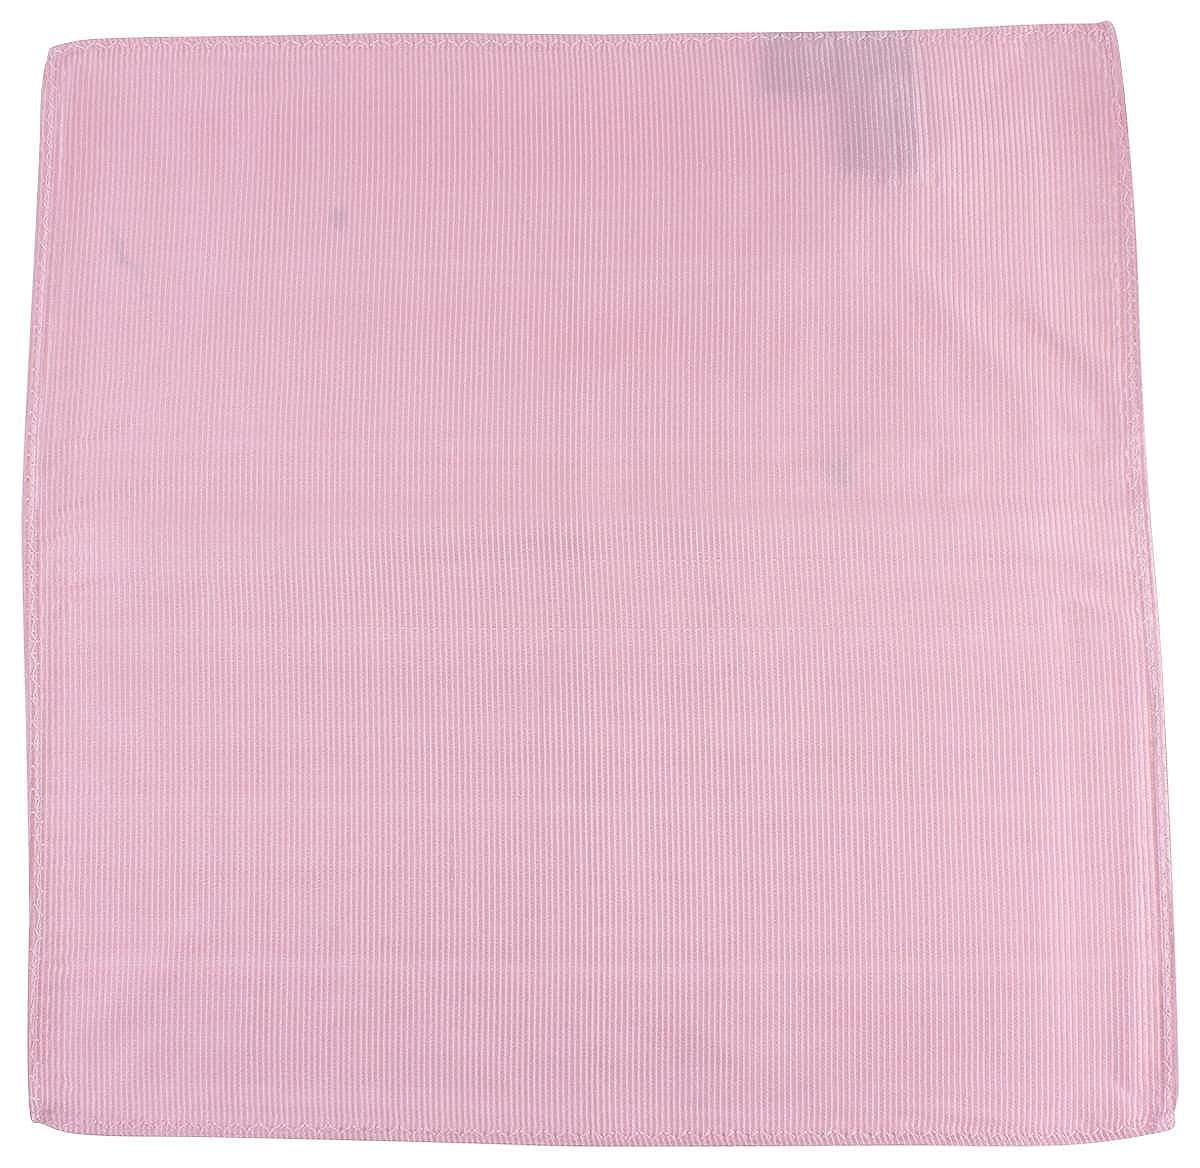 Knightsbridge Neckwear Mens Ribbed Silk Pocket Square Soft Pink